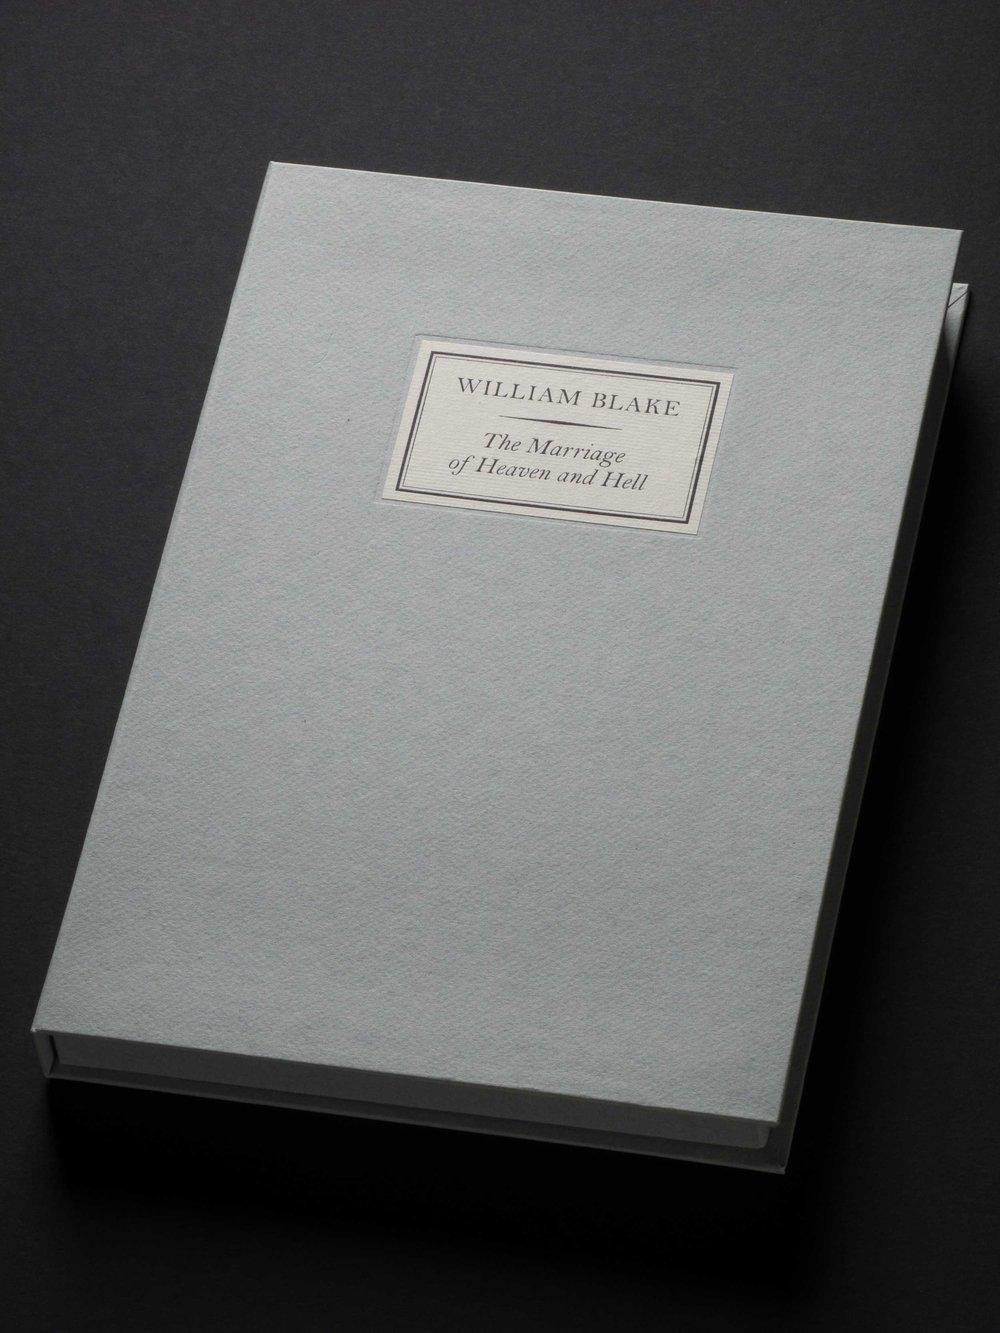 William-Blake-Marriage-of-Heaven-and-Hell-Folio-1.jpg